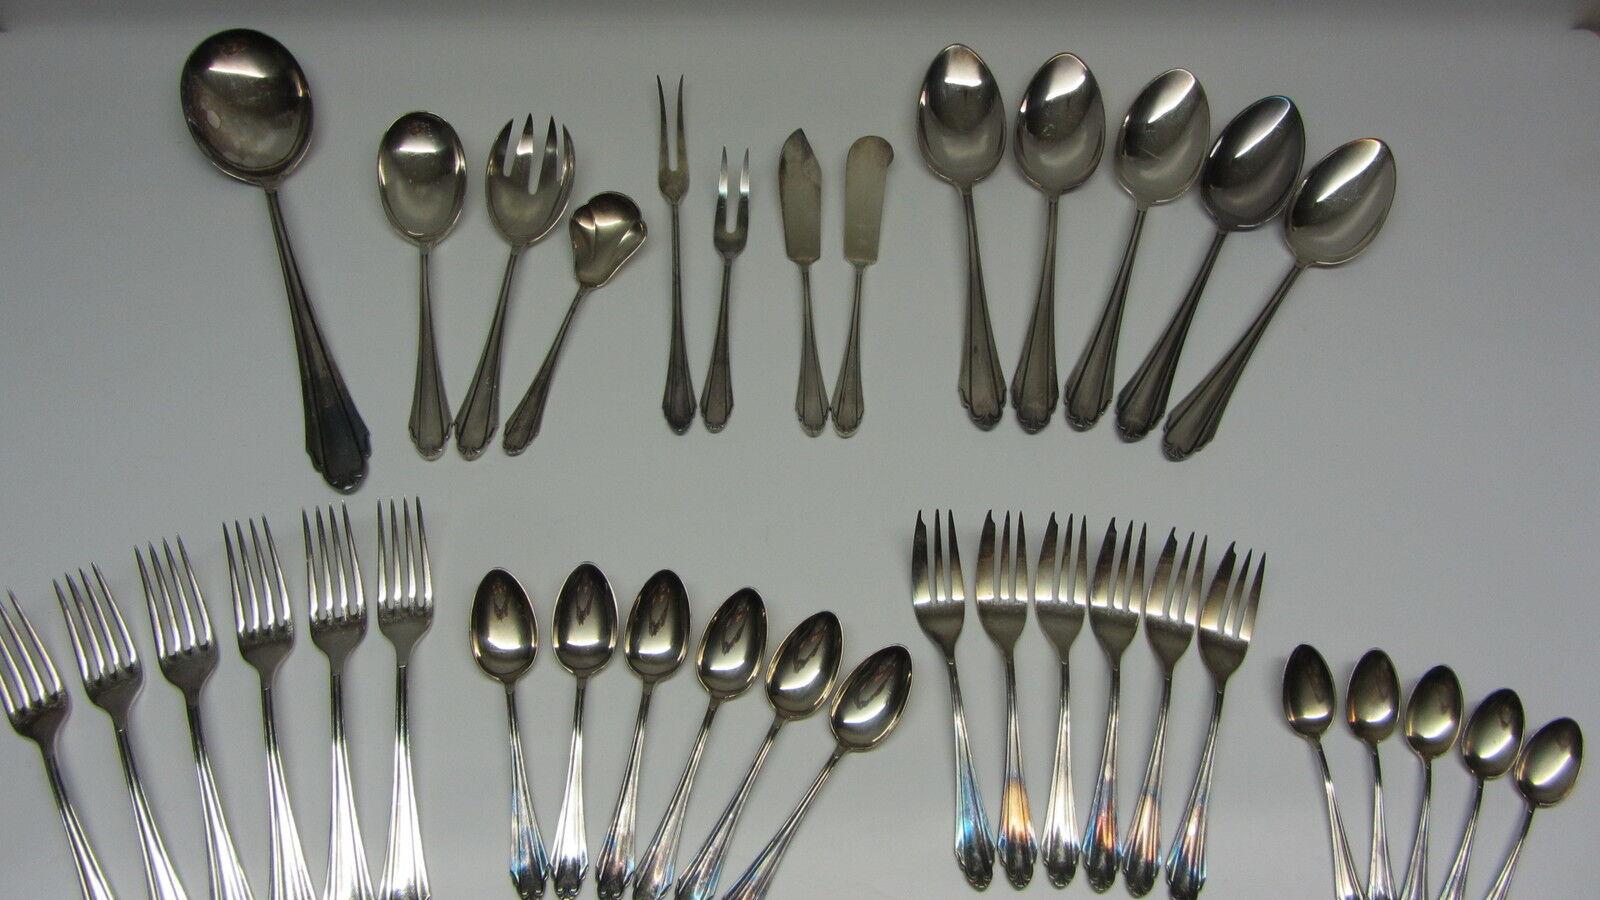 Konvolut alte Silberauflage Silber Silberschrott Silberschrott Silberschrott Martin 90 er Silber 36 Teile 26d6cd